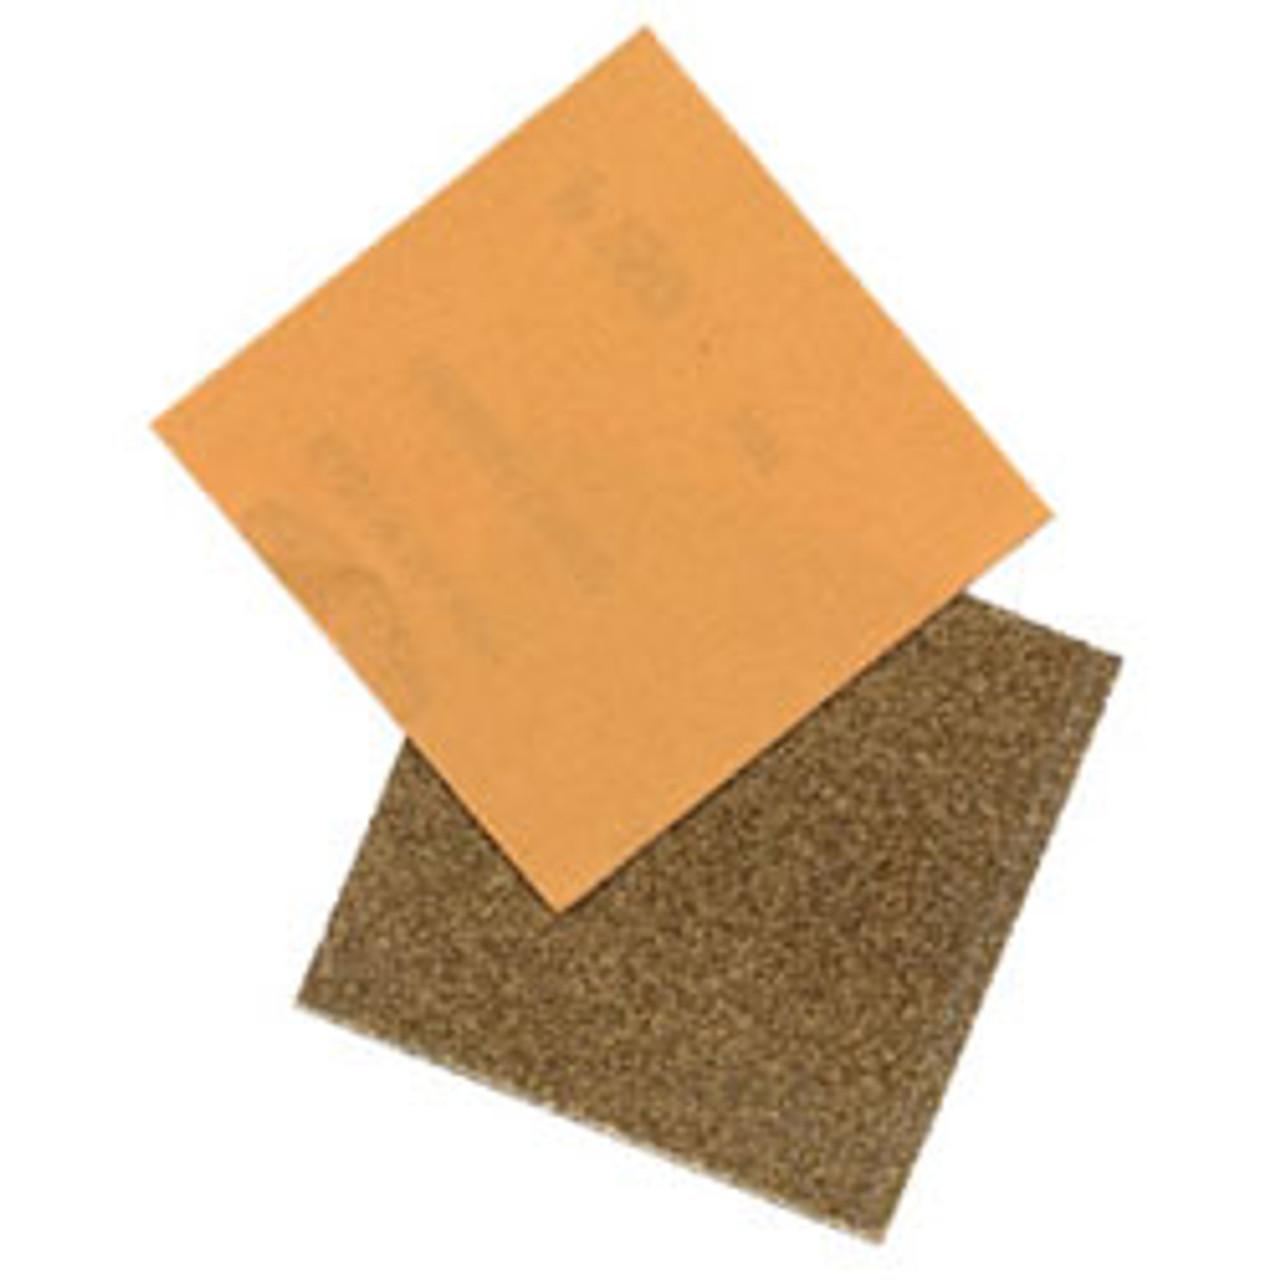 "Klingspor Abrasives Lightweight Aluminum Oxide, 4-1/2""x 4-1/2"" PSA Sheets, 220 Grit, 5pk"